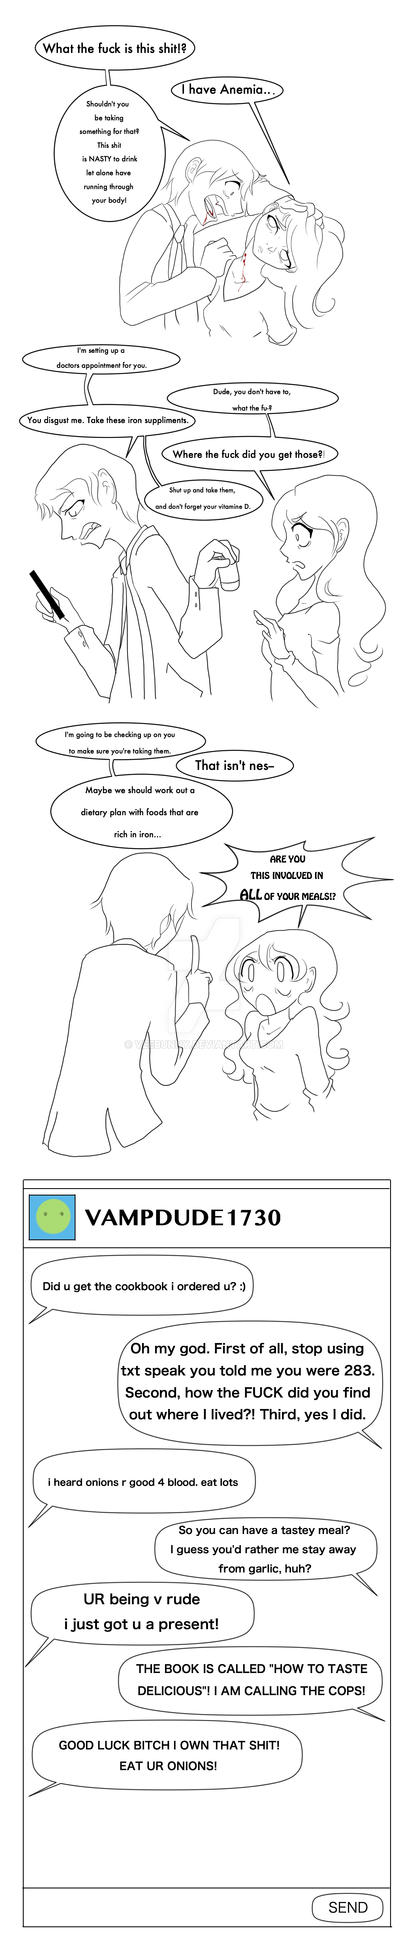 Vampire Problems: Anemia by VeeBunny